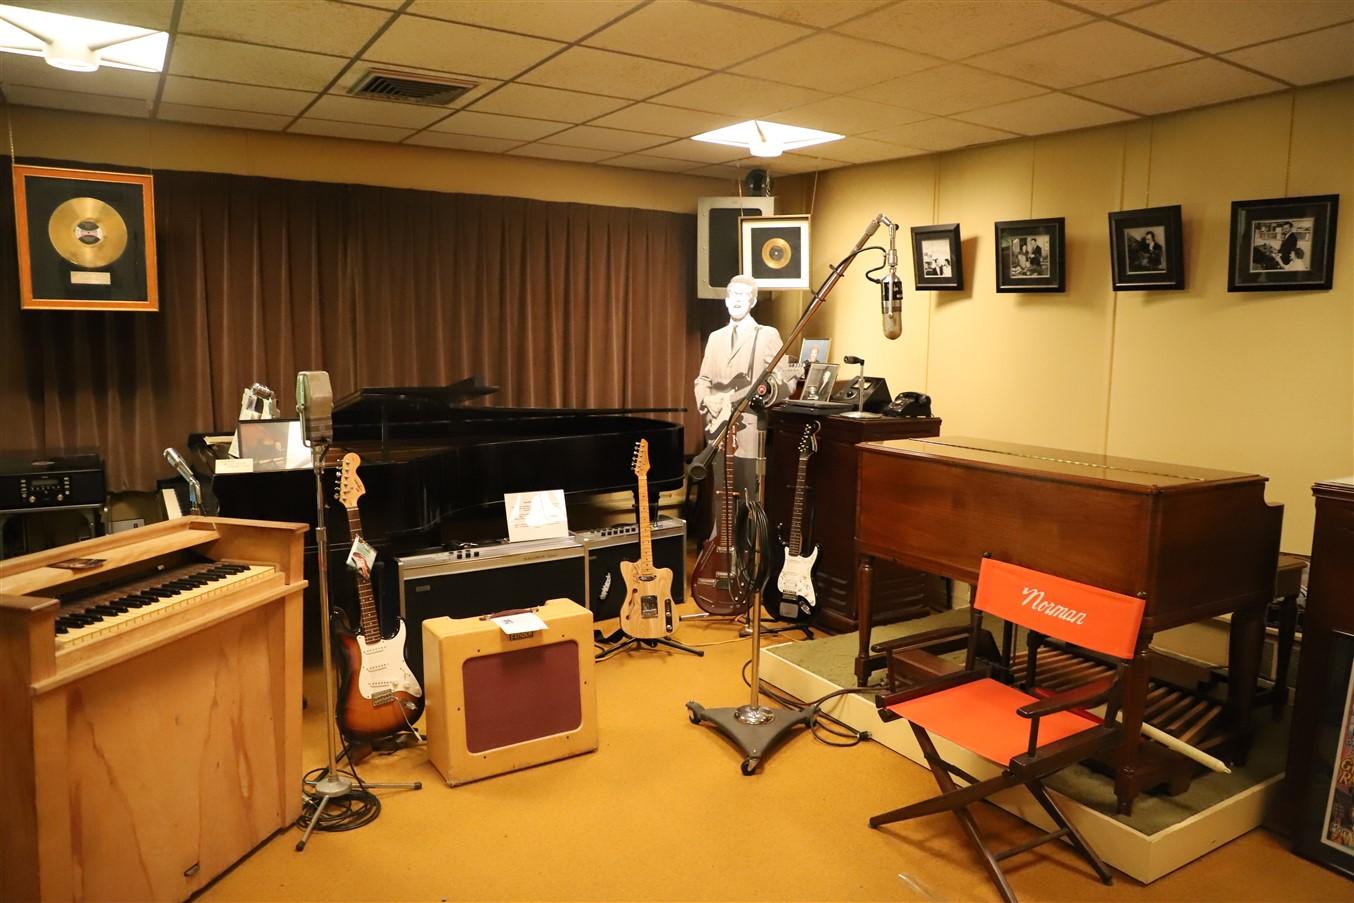 2019 05 28 231 Clovis NM Norman Petty Studio